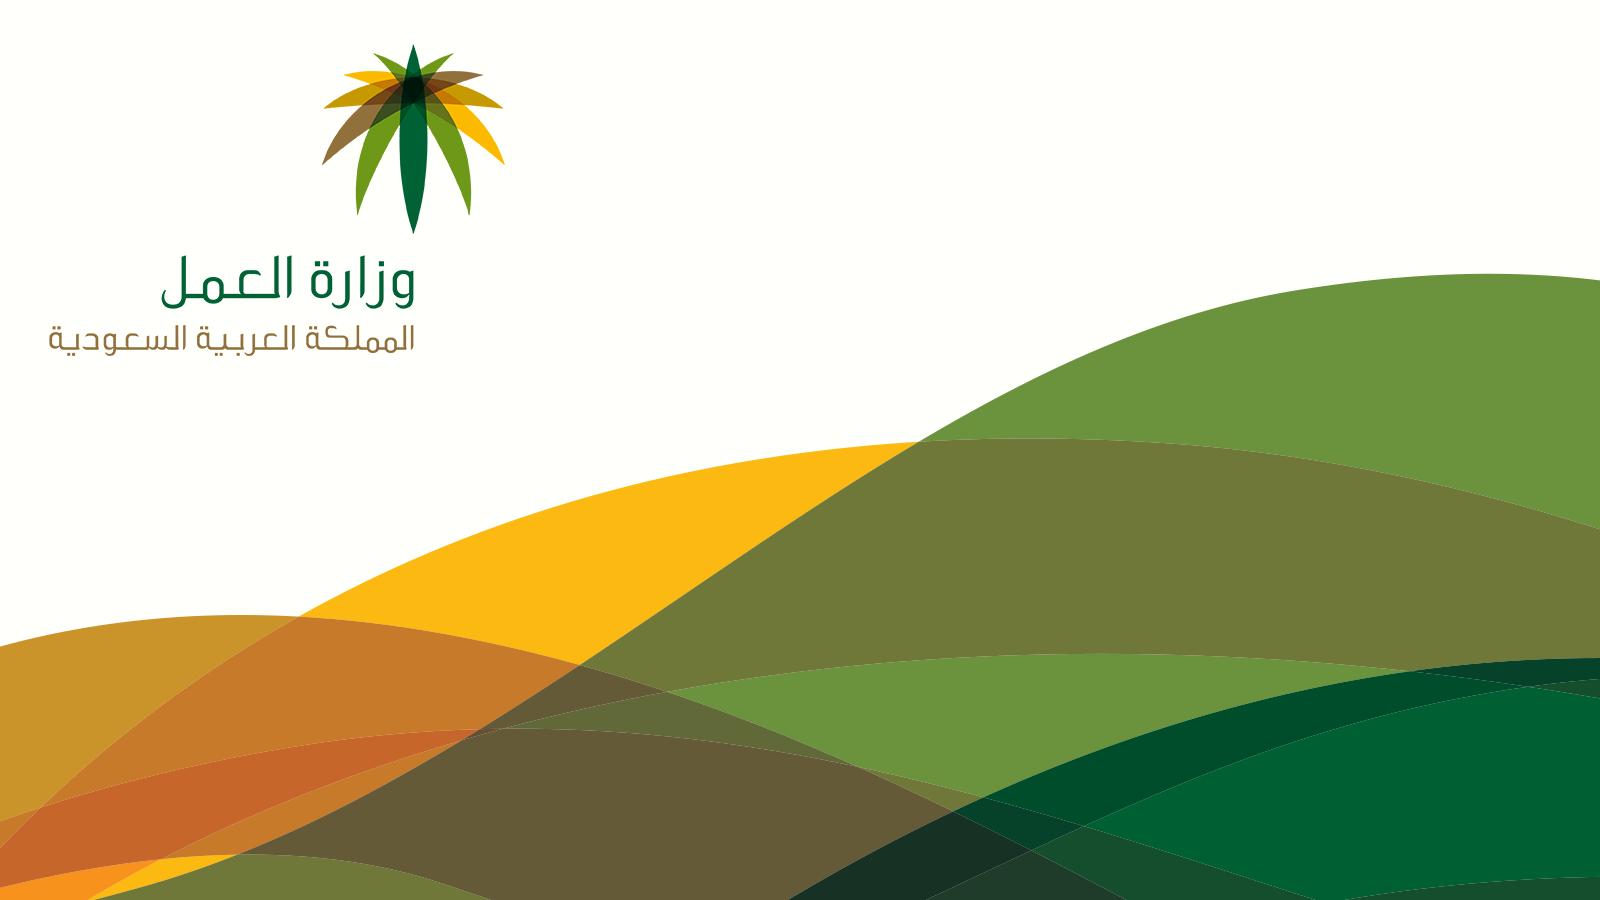 Photo of موقع وزارة العمل السعودية وطريقة التعامل معه ورابط الدخول الي الموقع